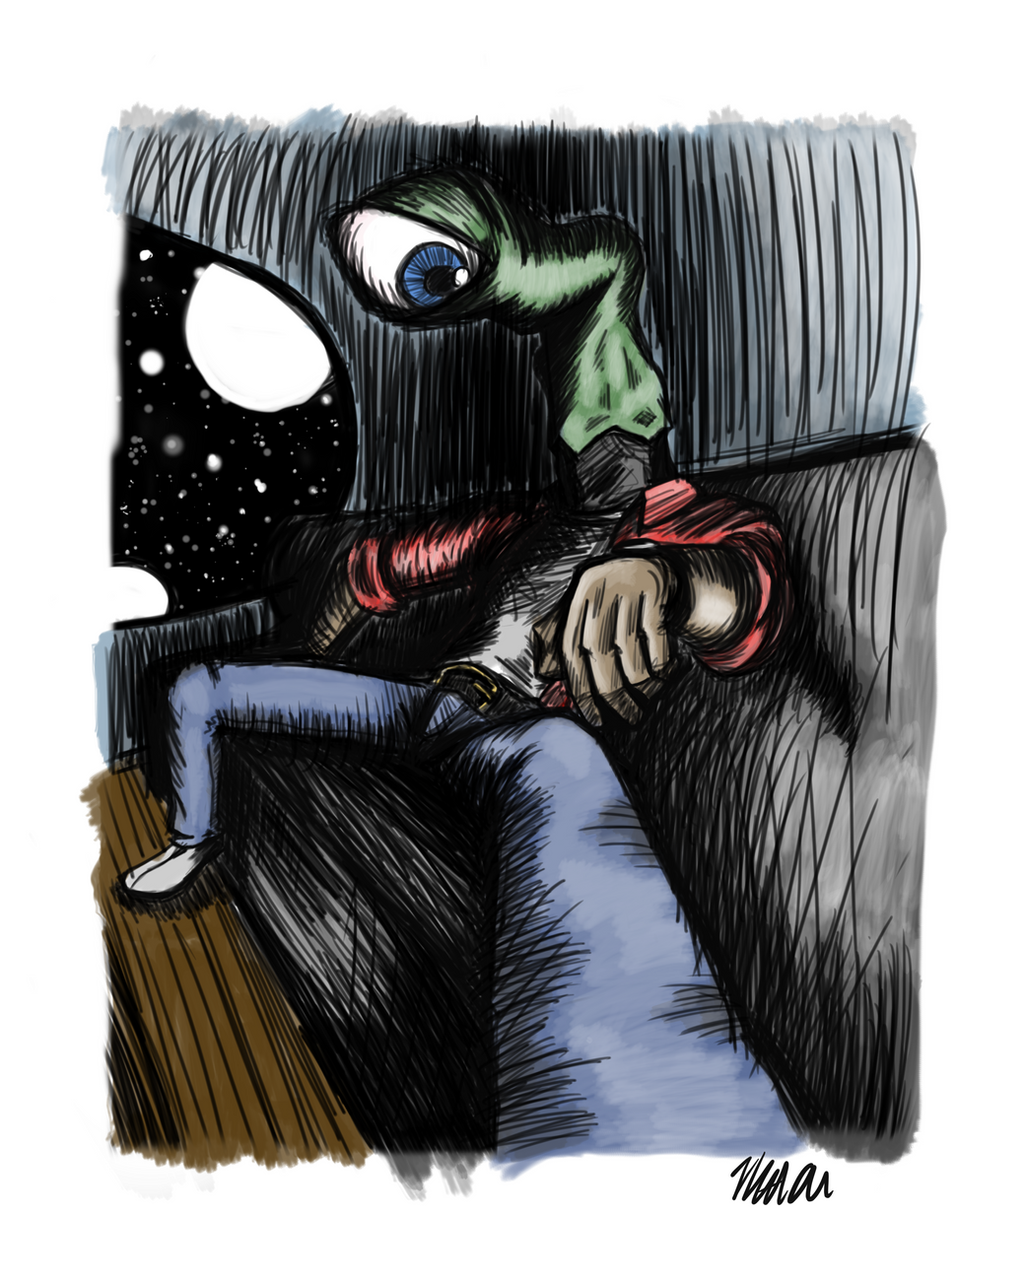 Alien Living Room (color) By Madamz On DeviantArt